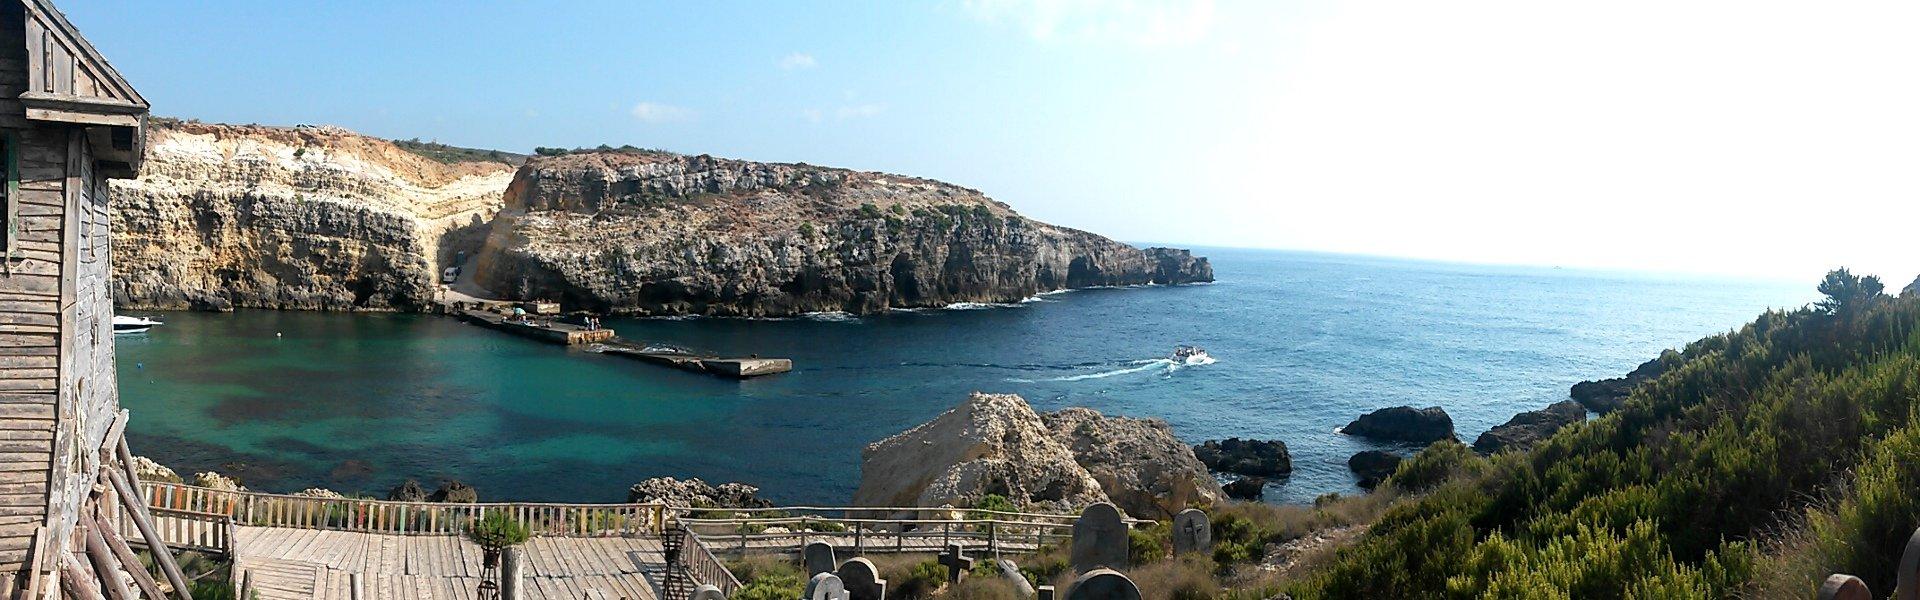 malta-island-popeye-beach-view